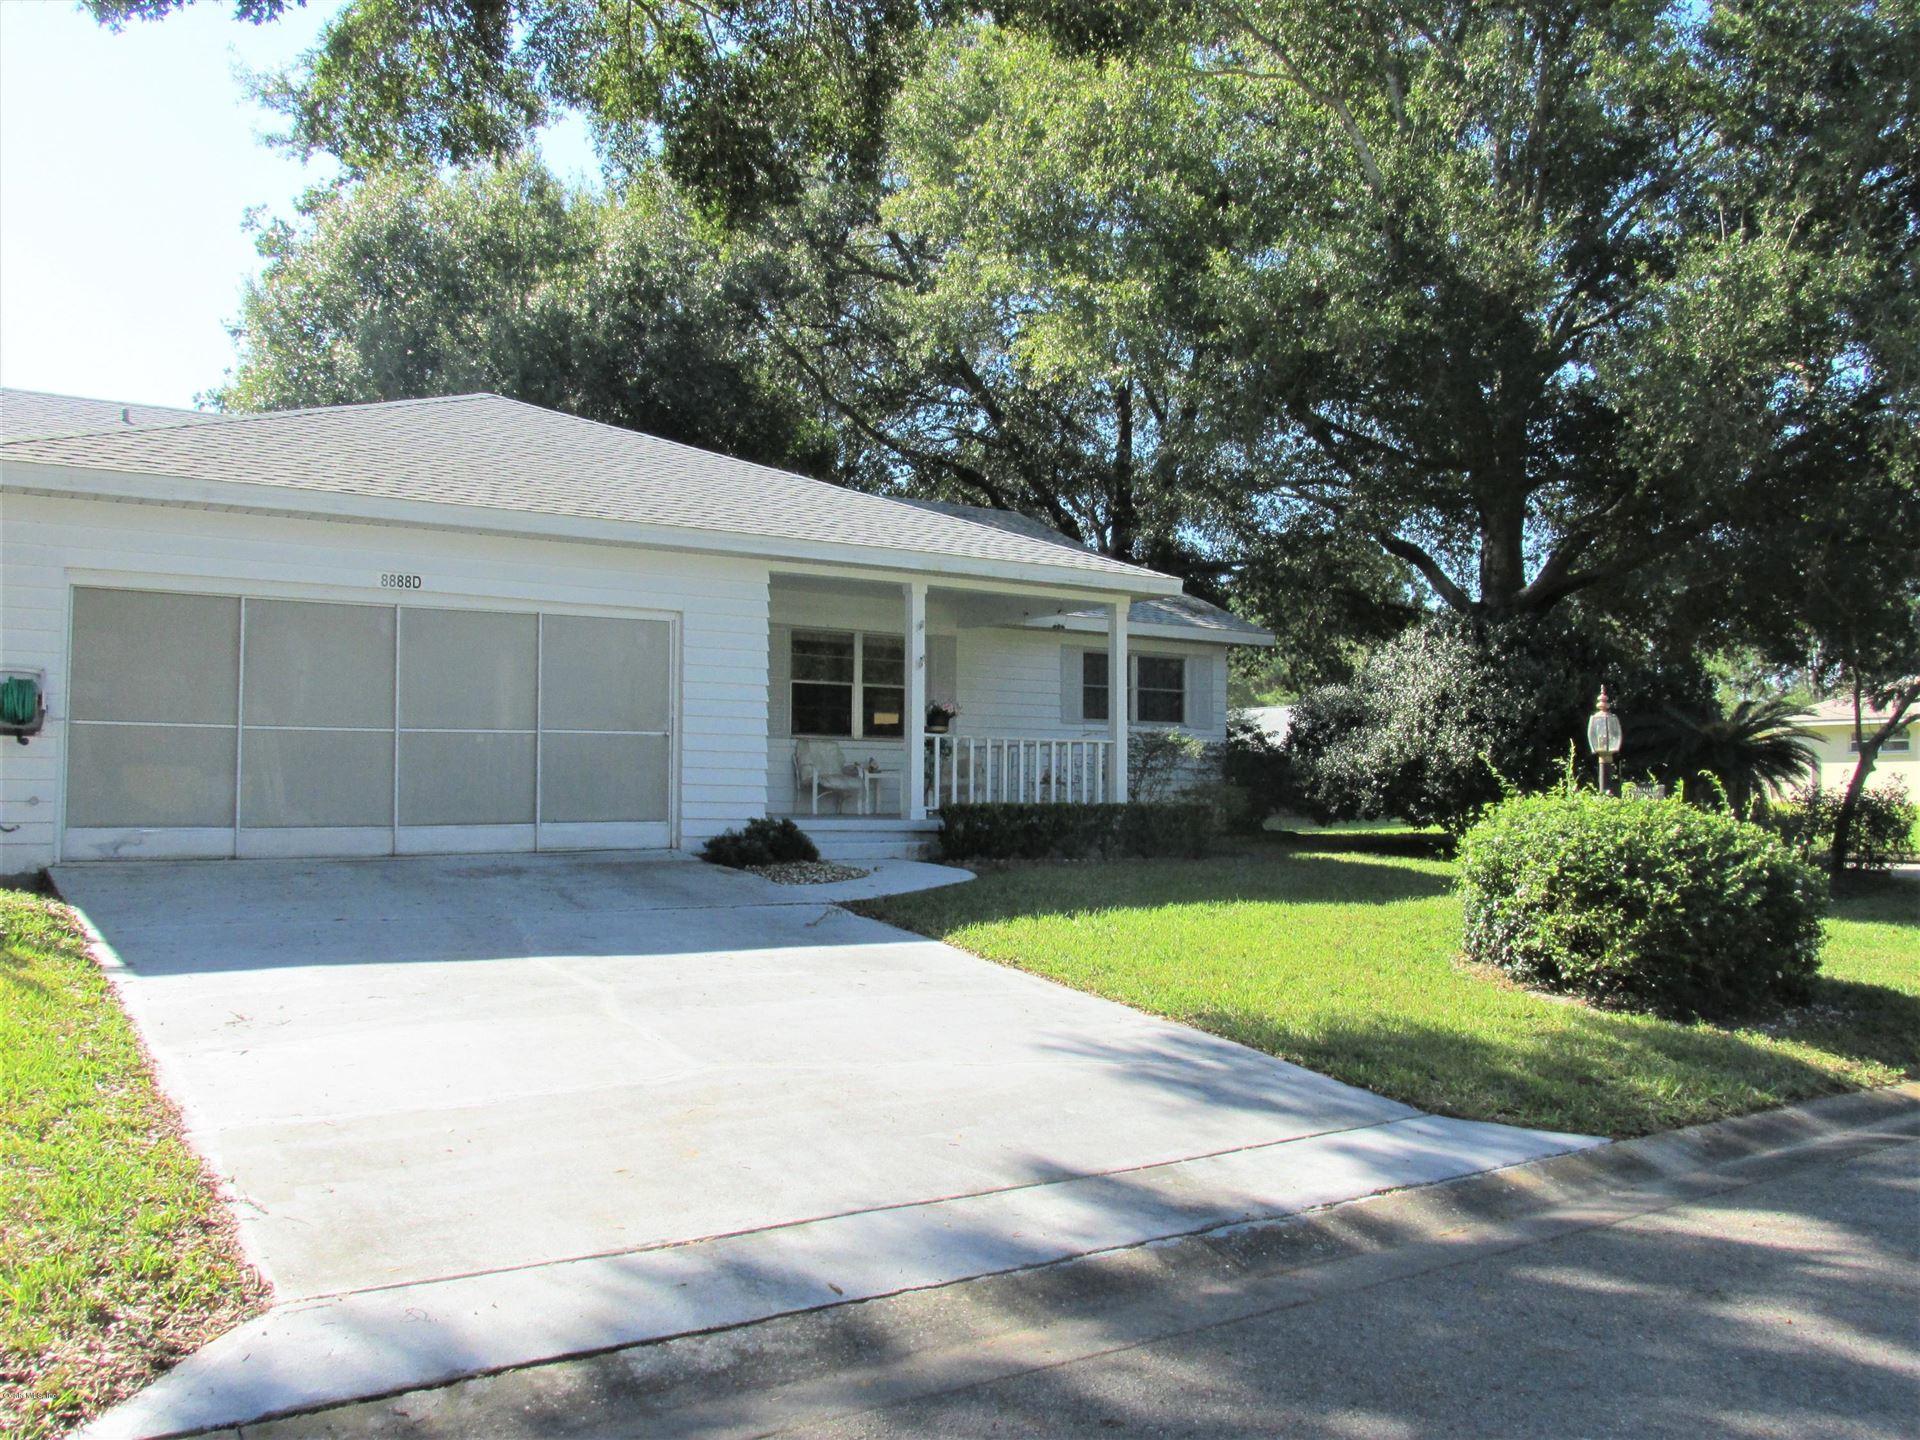 8888 SW 95th Lane #D, Ocala, FL 34481 - MLS#: 566130